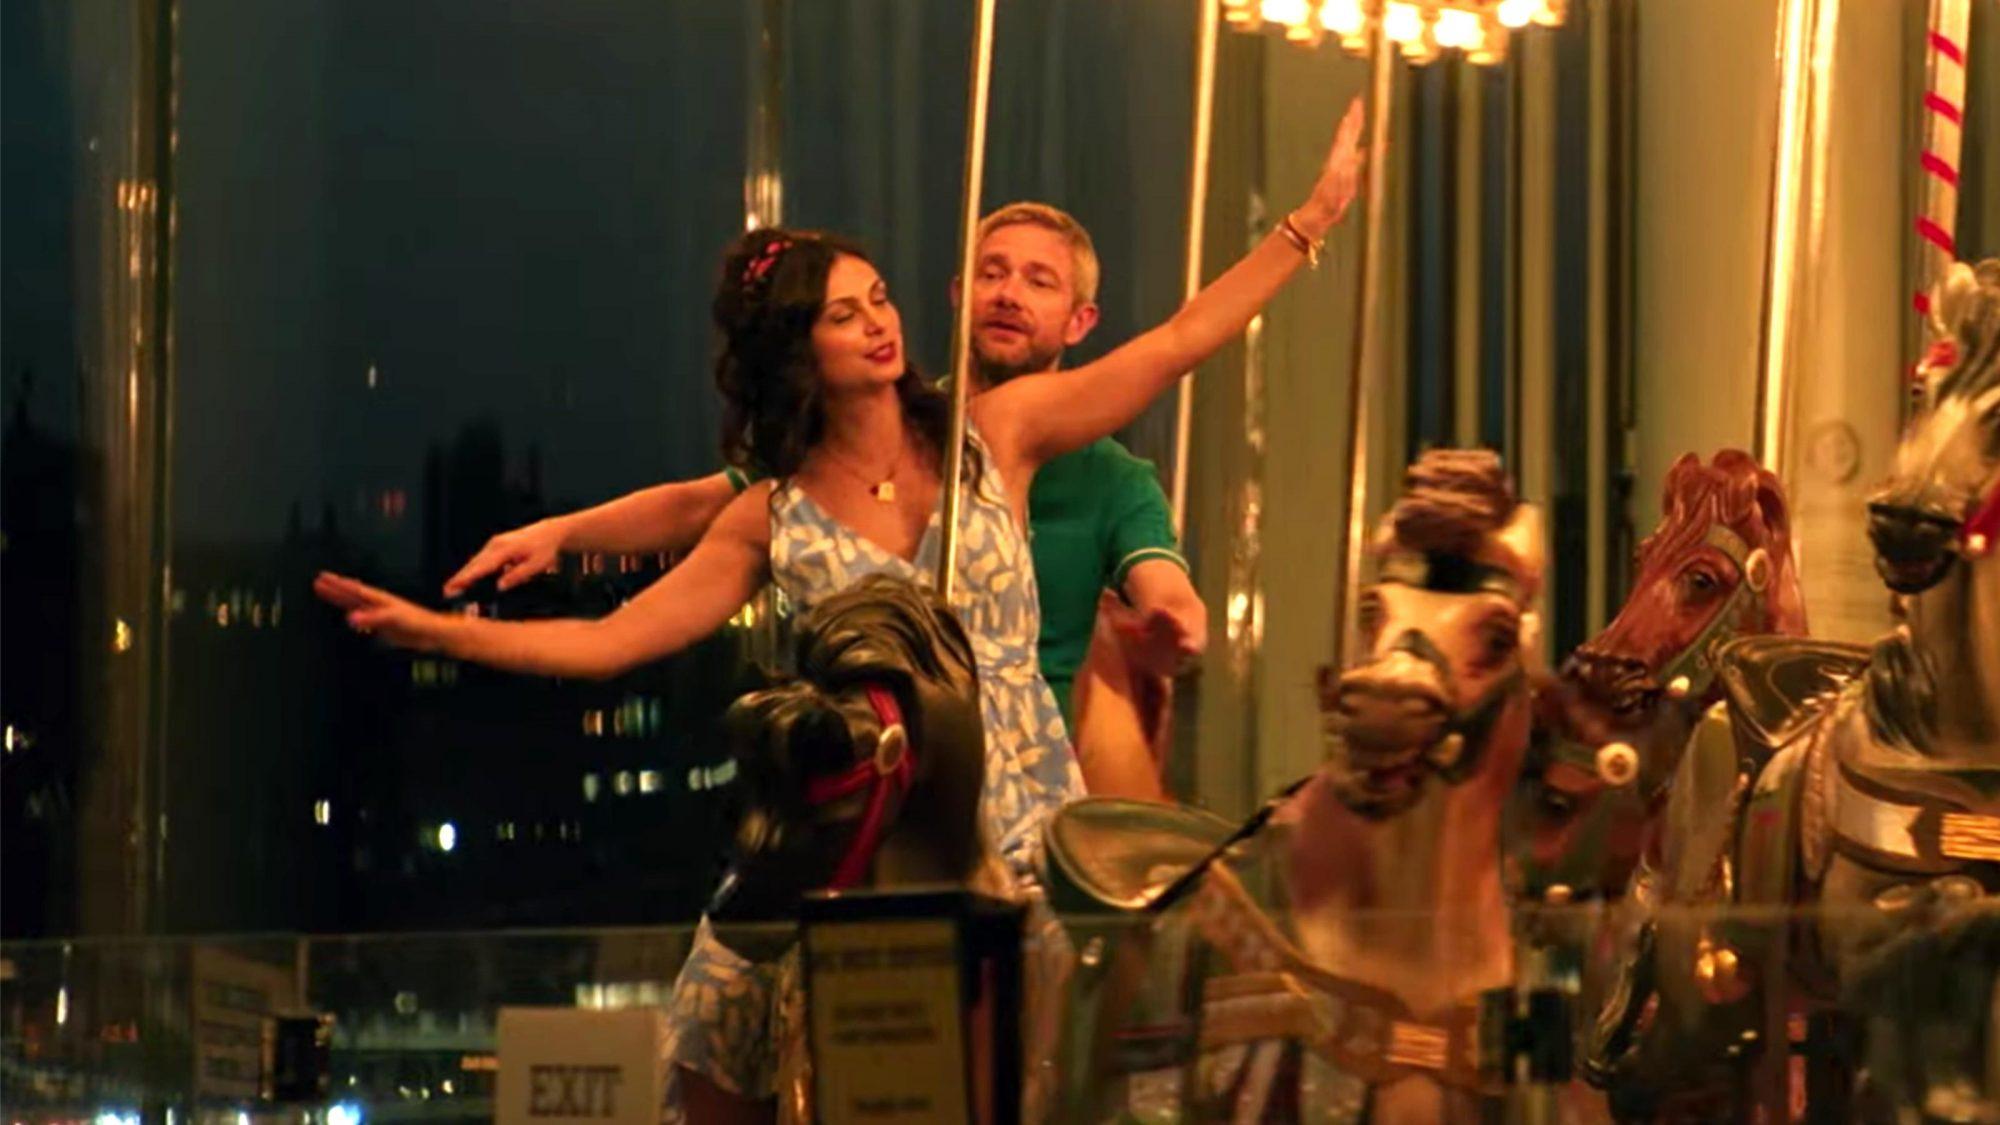 Ode to Joy (screen grab) Martin Freeman & Morena Baccarin - Official Trailer I HD I IFC Films https://www.youtube.com/watch?v=2HHDGIC01YI CR: IFC Films